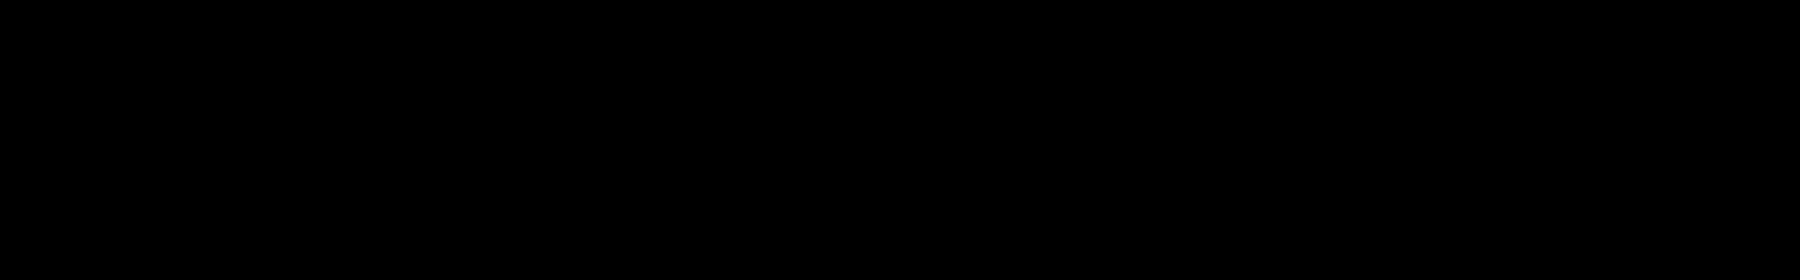 Pure 808's audio waveform